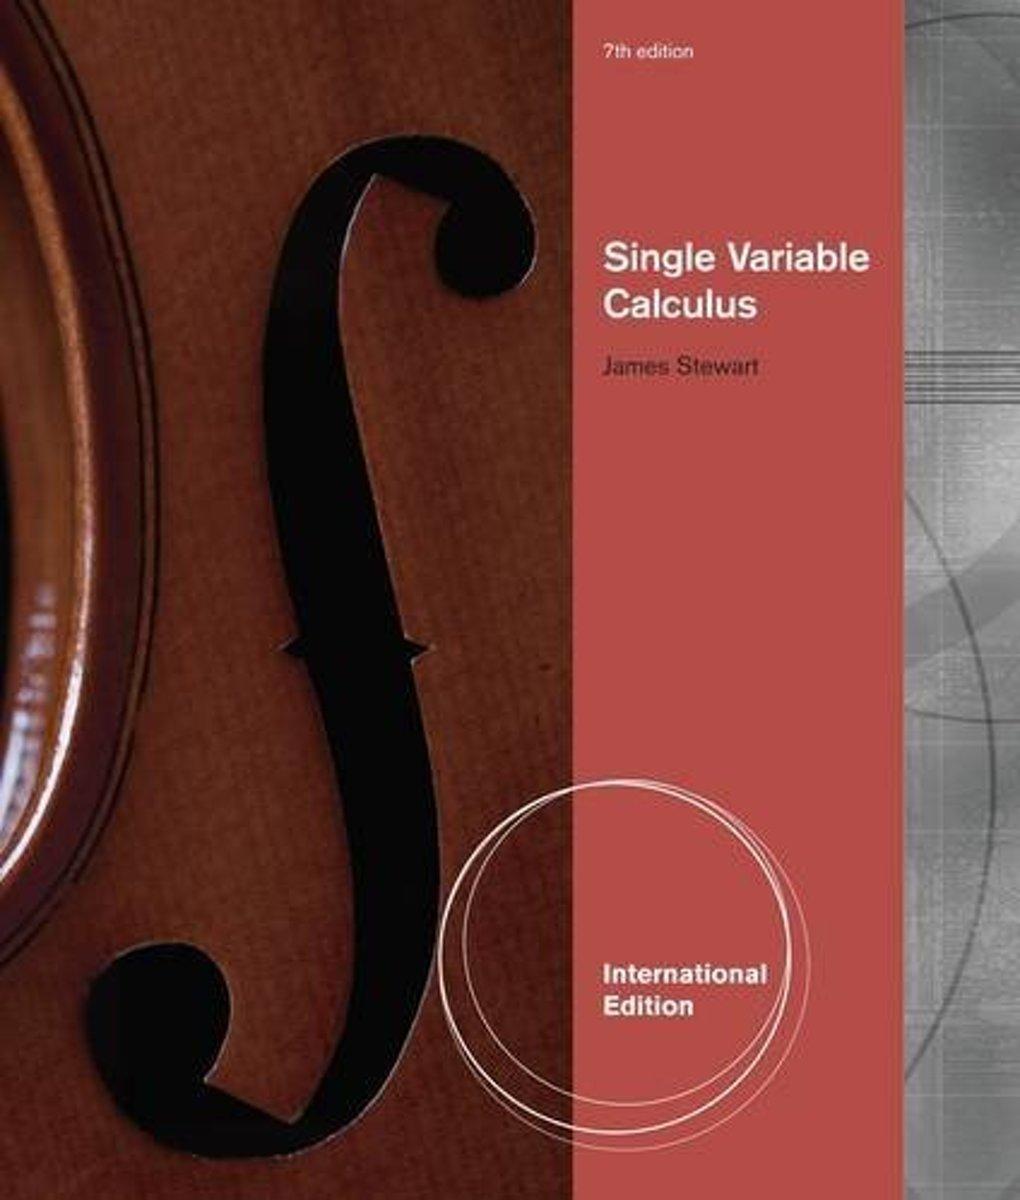 bol.com   Single Variable Calculus, International Metric Edition    9780538498852   James Stewart.